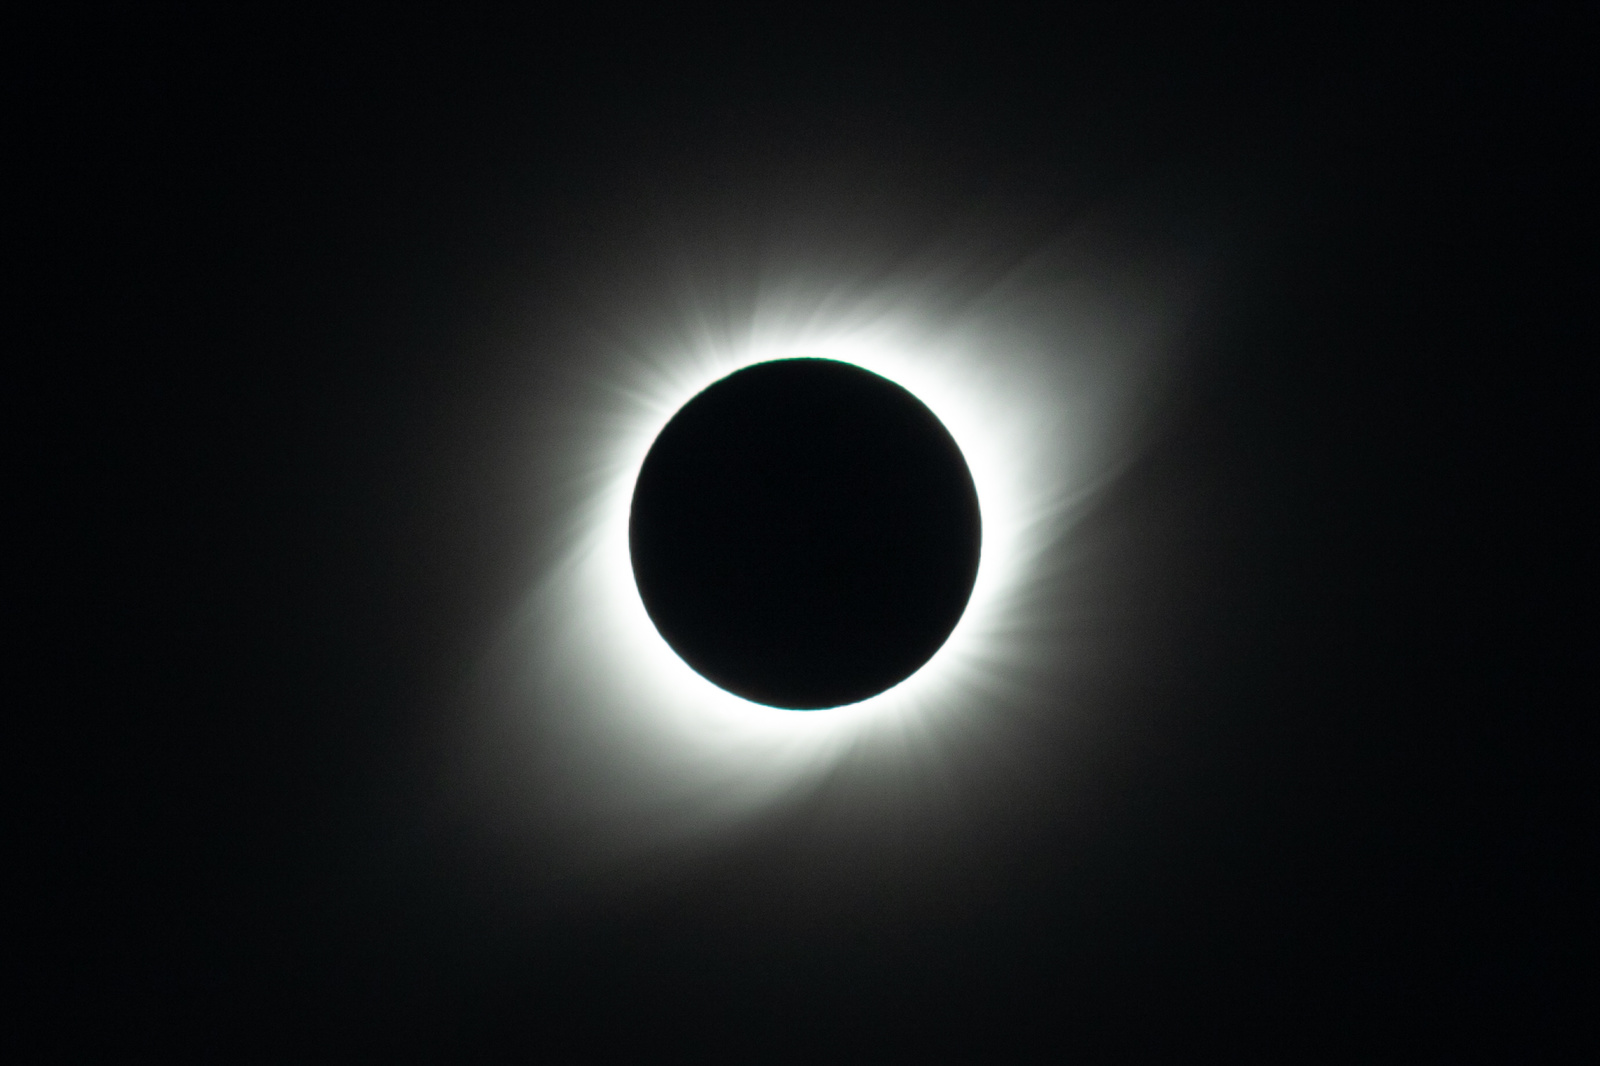 _MGL8538-corona.thumb.jpg.feaa5b817af2ff1b725f73600c52572a.jpg